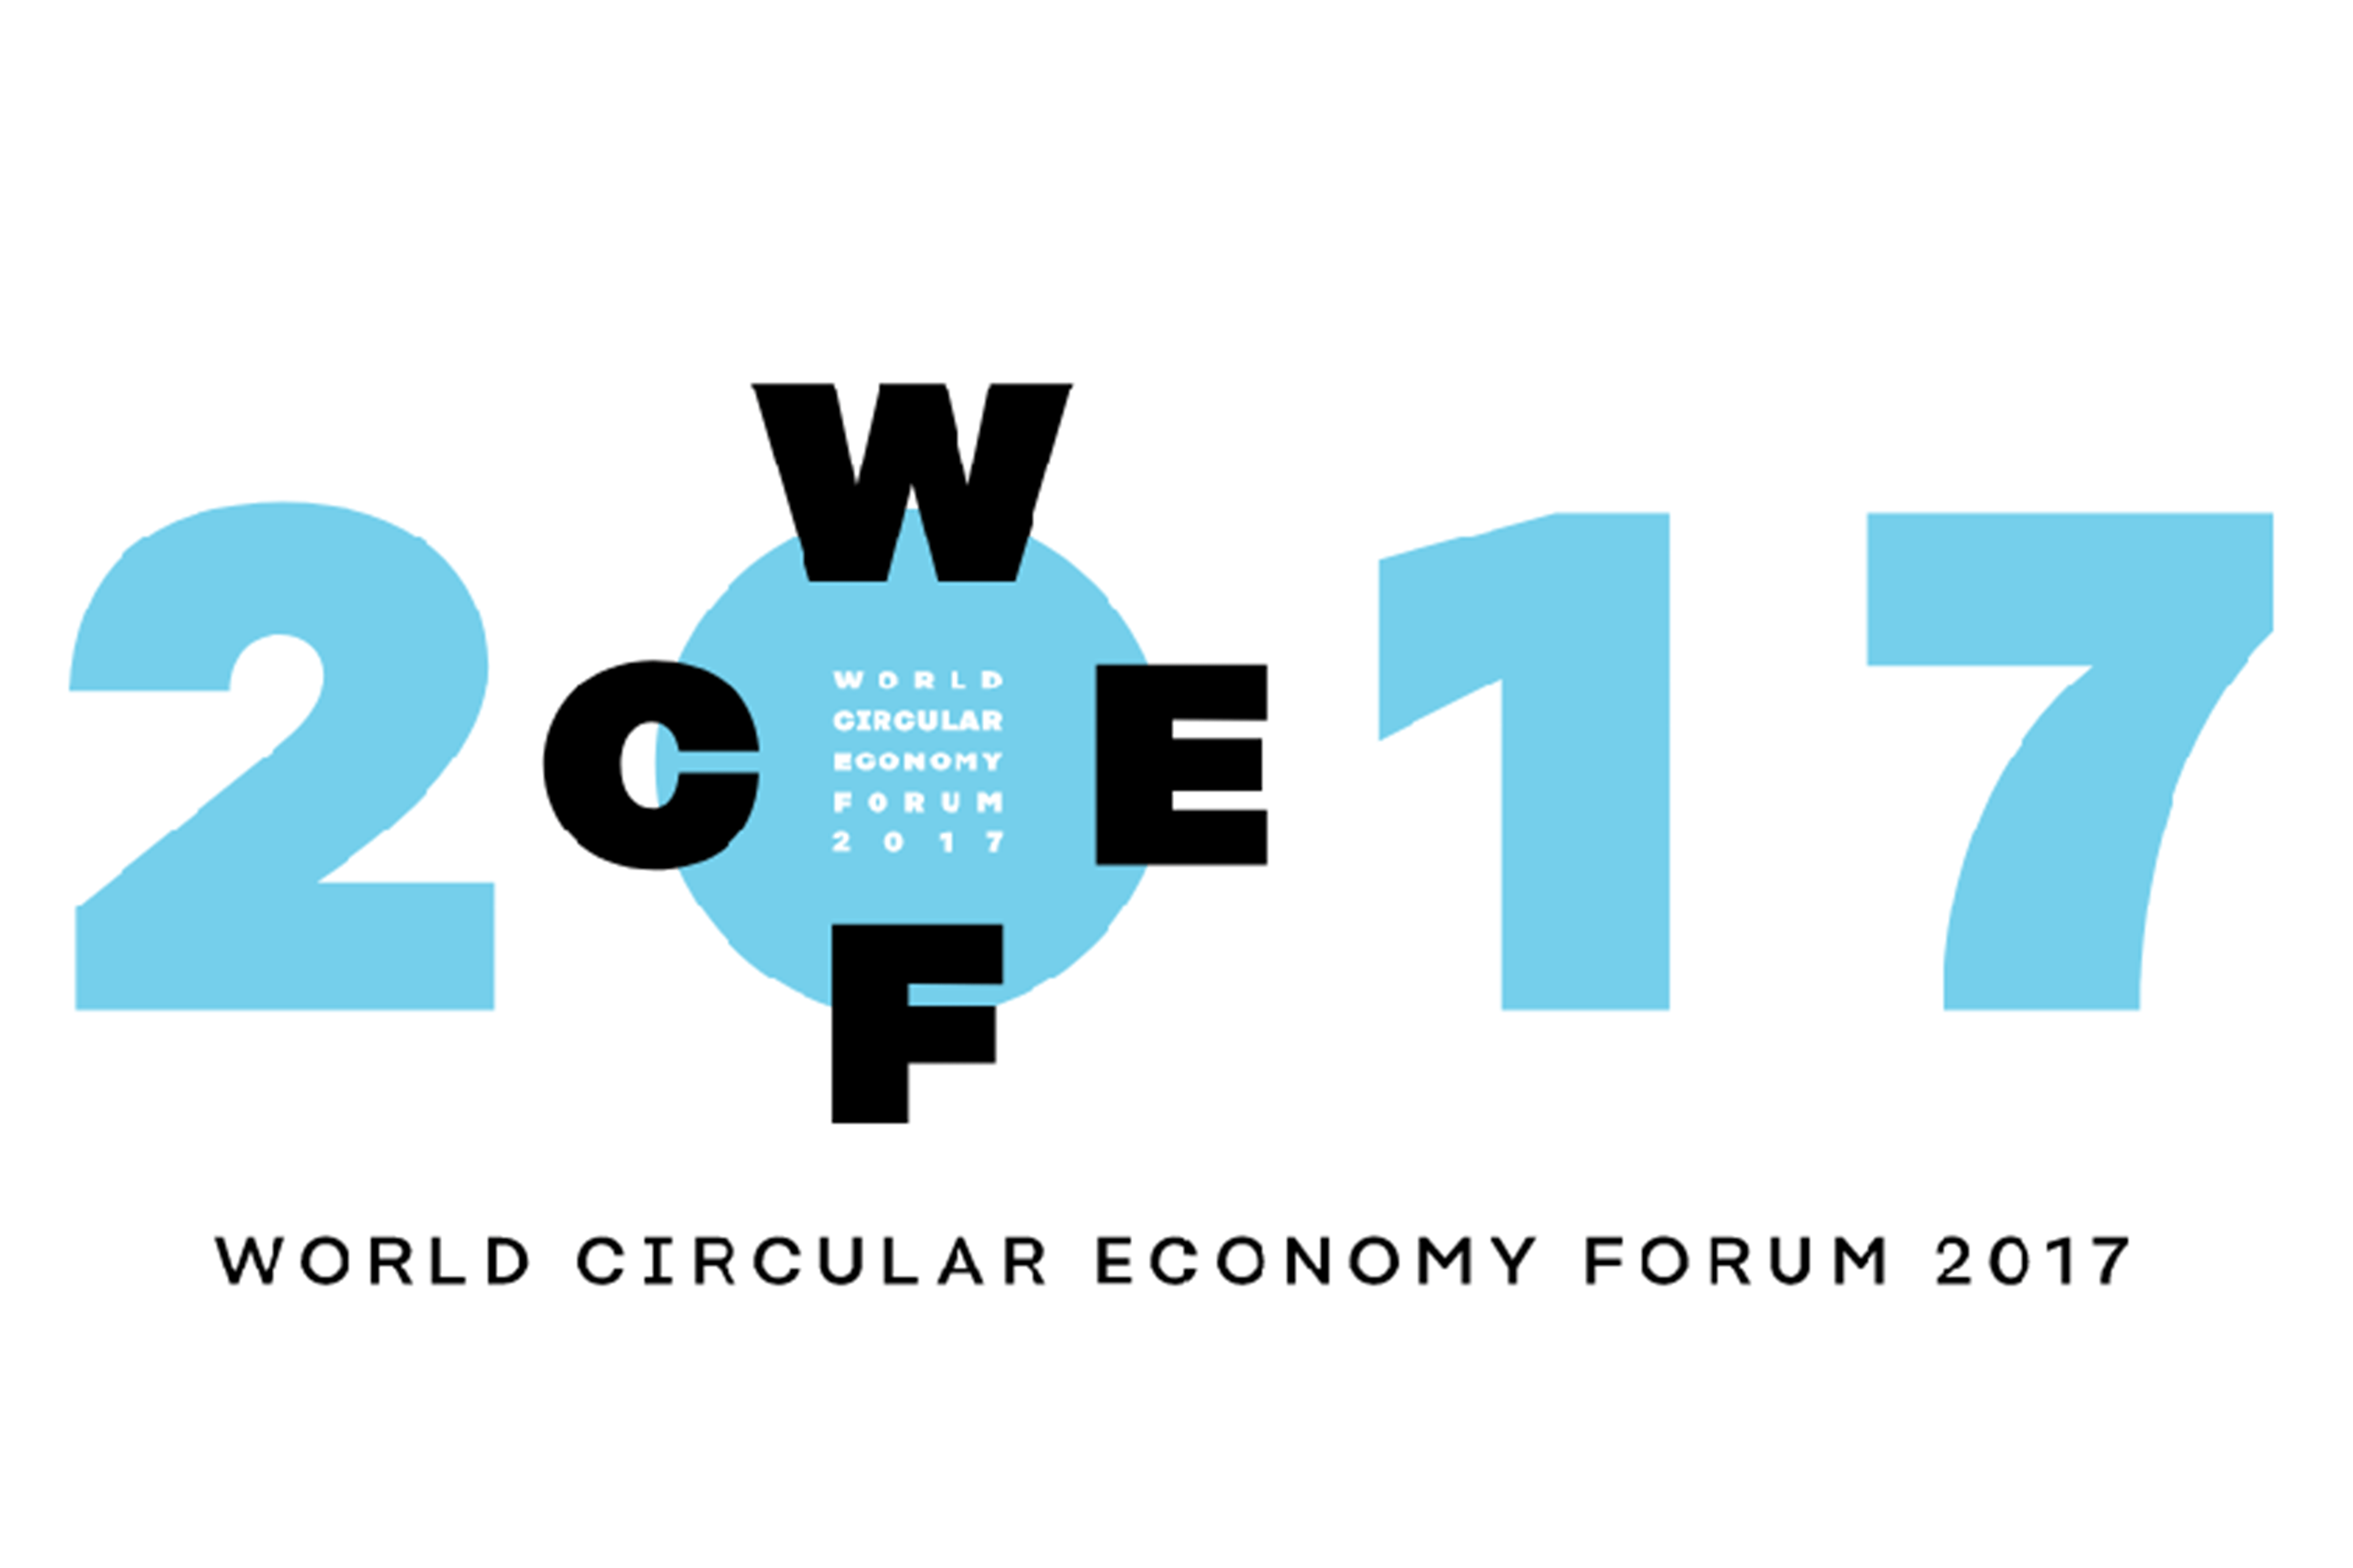 World Circular Economy Forum 2017